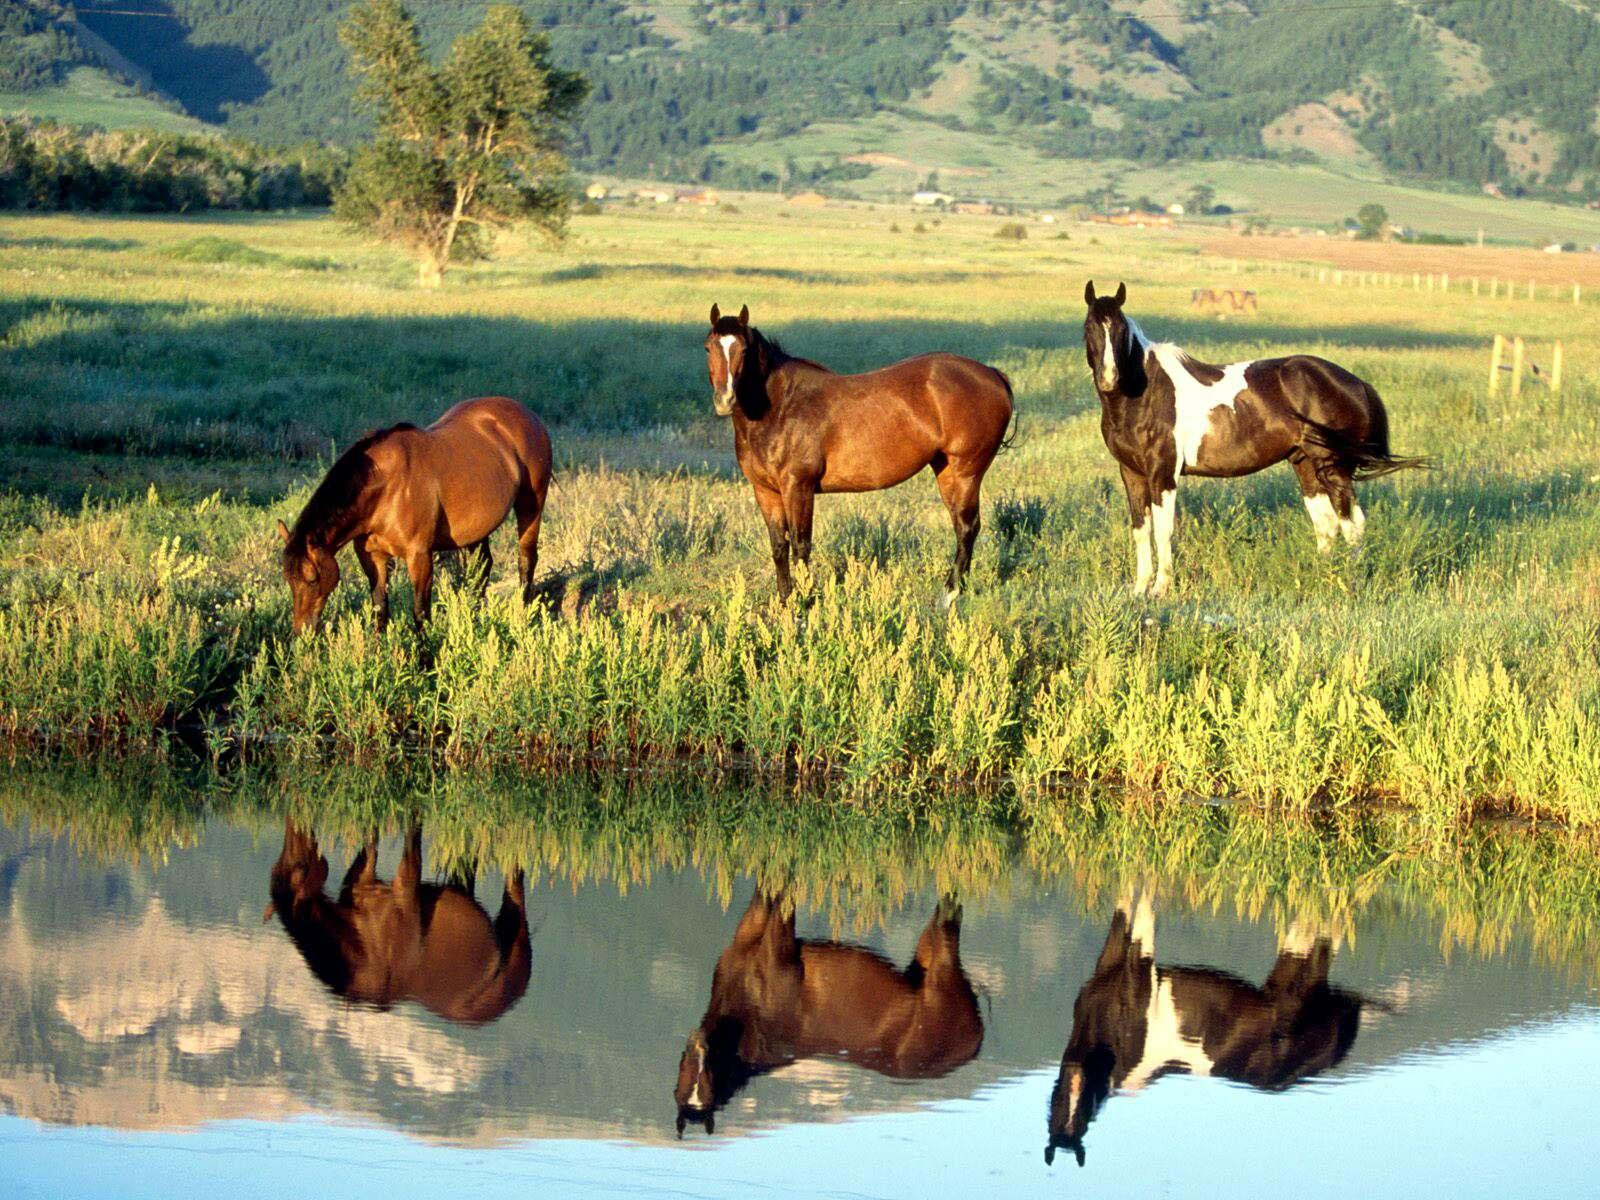 036 koně zvířata horses animals